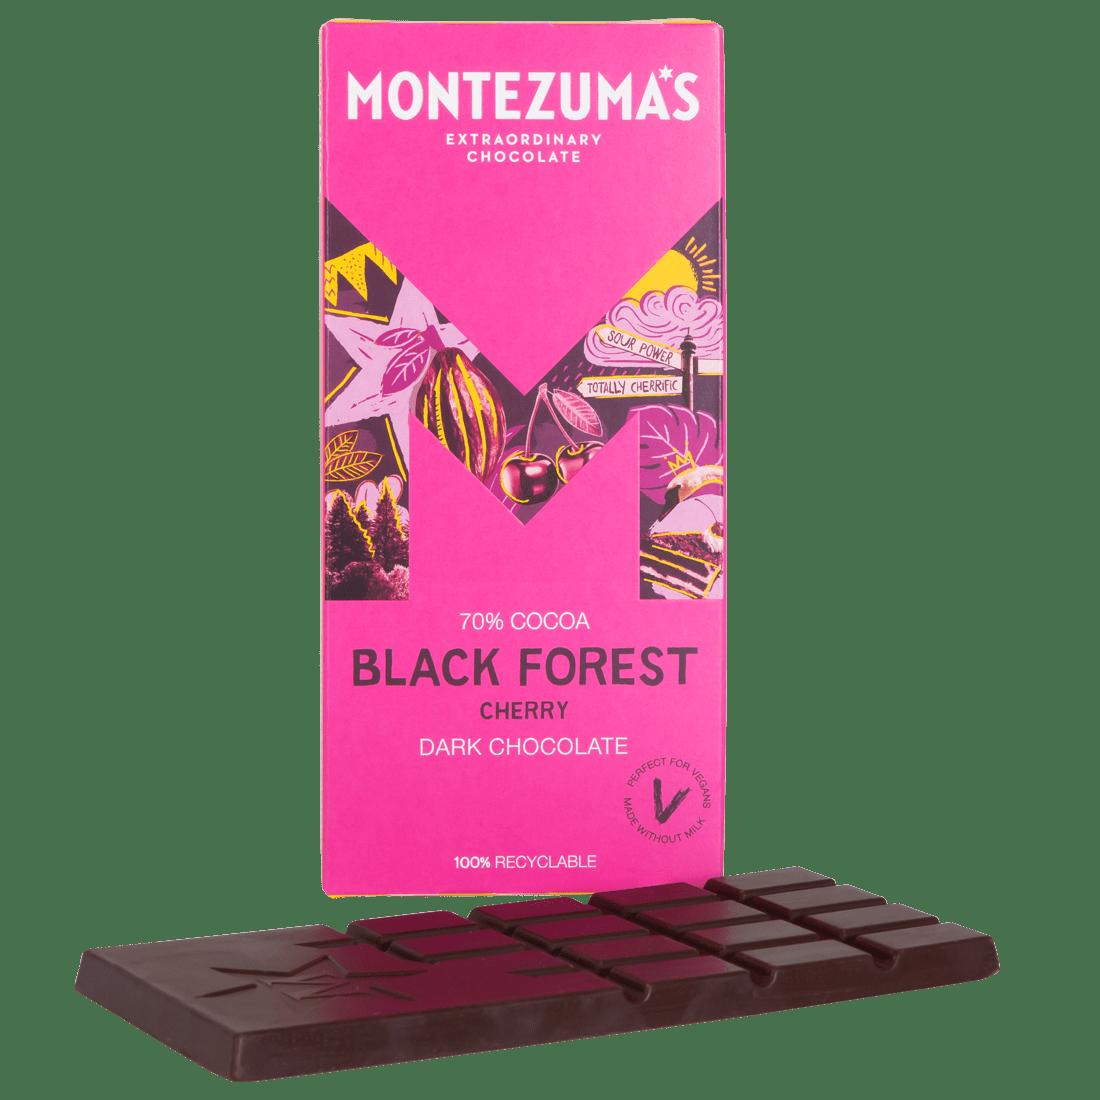 Chocolate Bars Black Forest - Dark Chocolate with Cherry